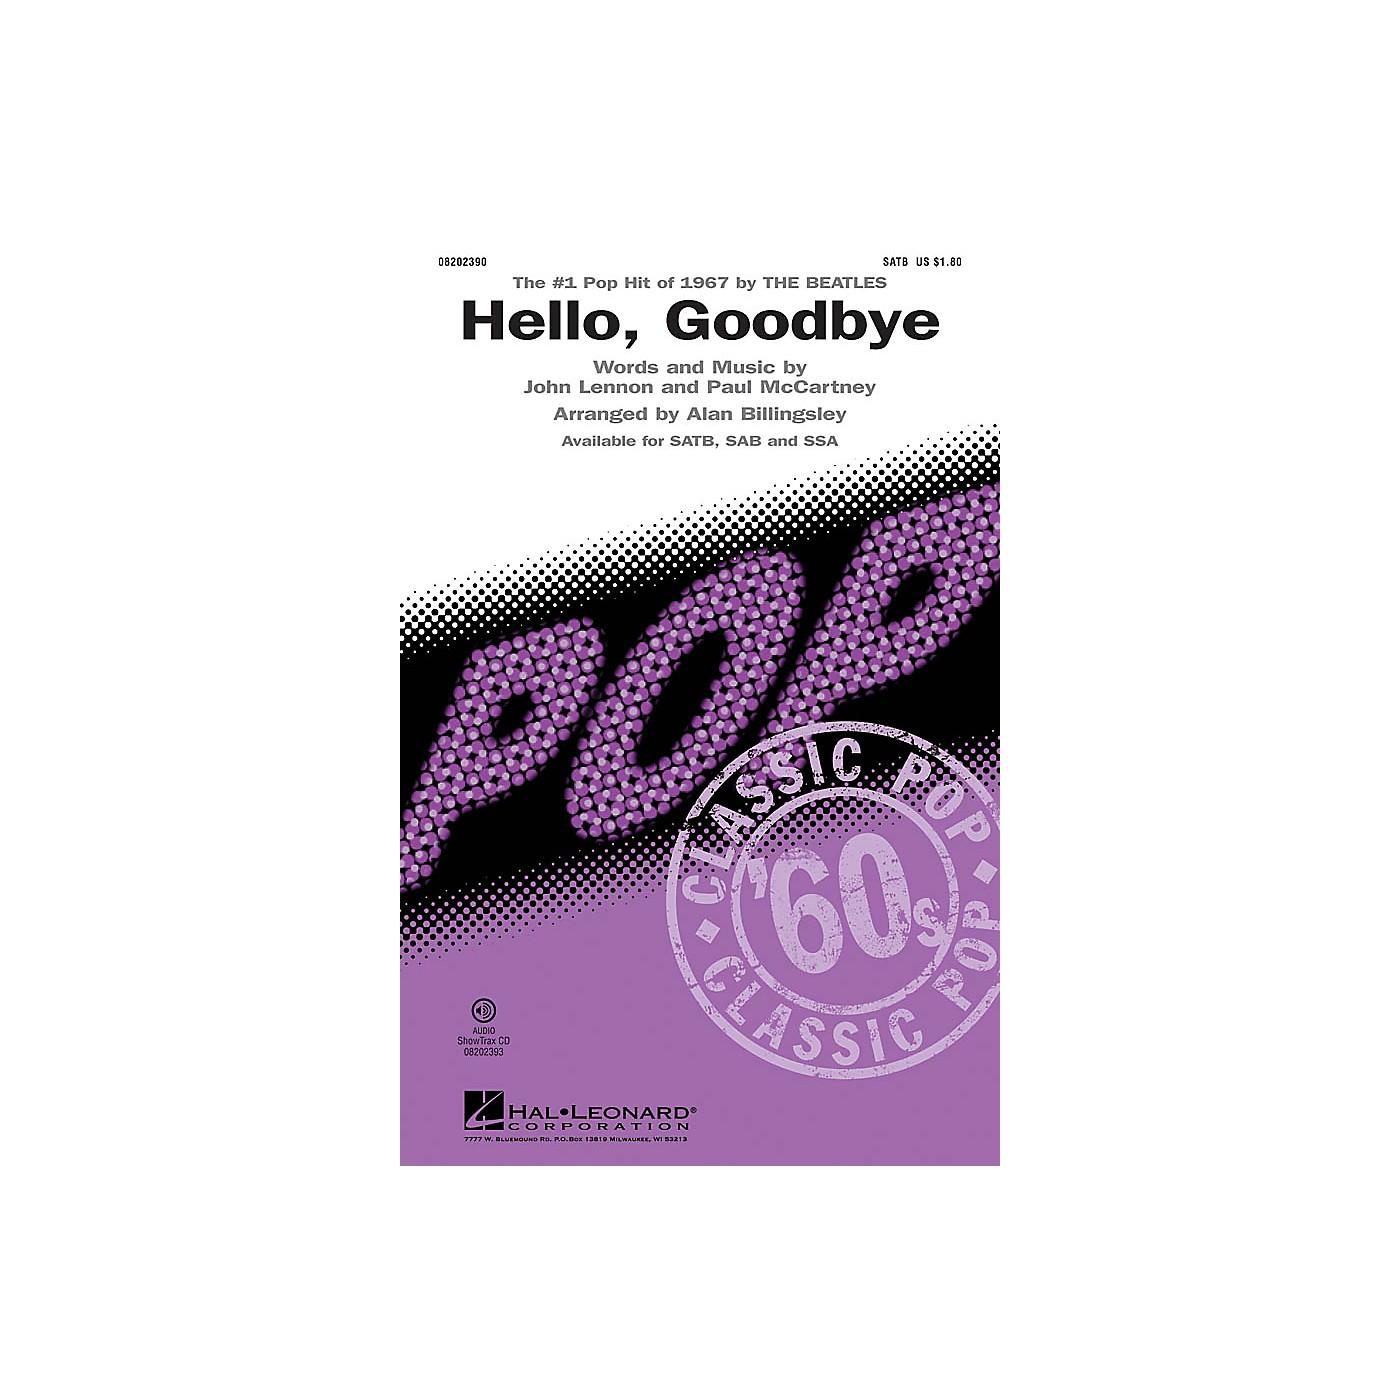 Hal Leonard Hello, Goodbye ShowTrax CD by The Beatles Arranged by Alan Billingsley thumbnail